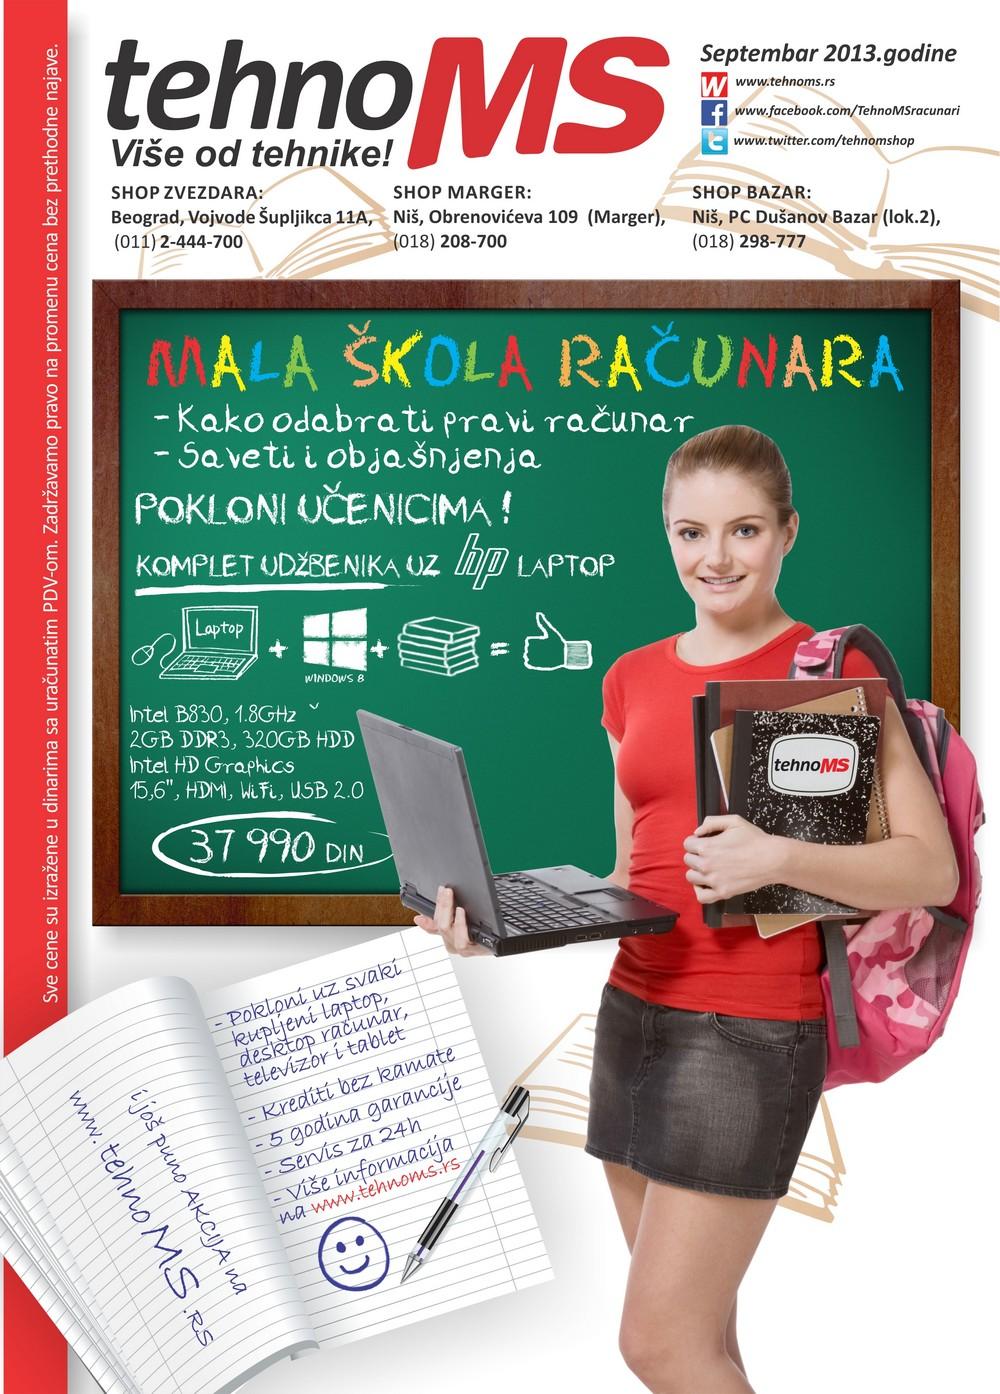 Tehno MS katalog super ponuda